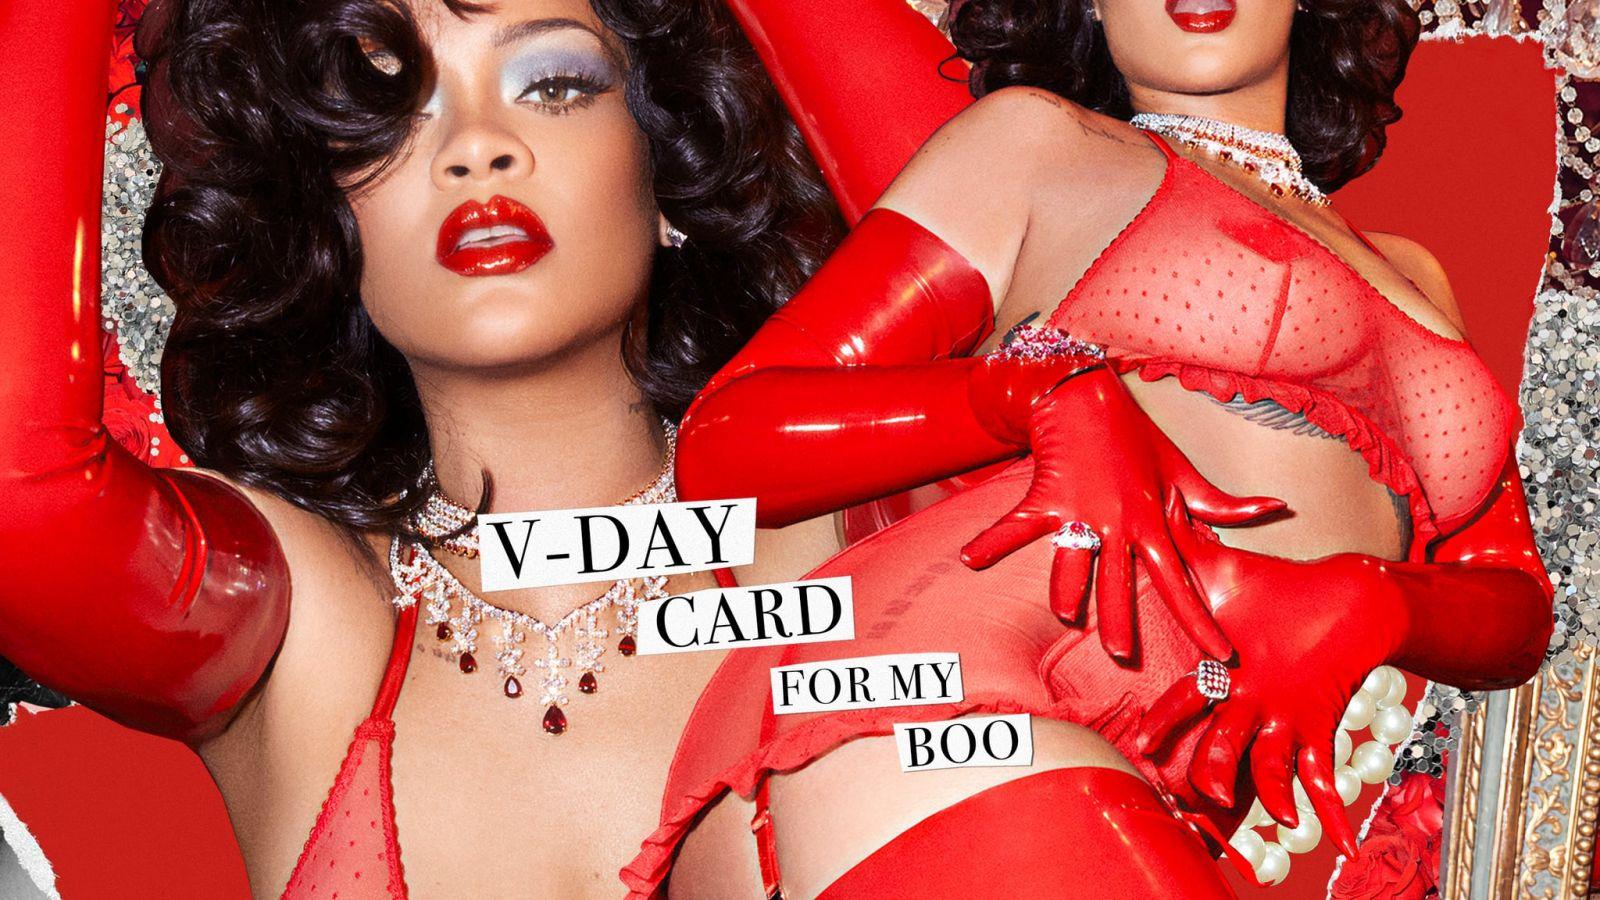 Rihanna: Δοκιμάζει εσώρουχα για του Αγίου Βαλεντίνου και μας ξετρελαίνει [pics]